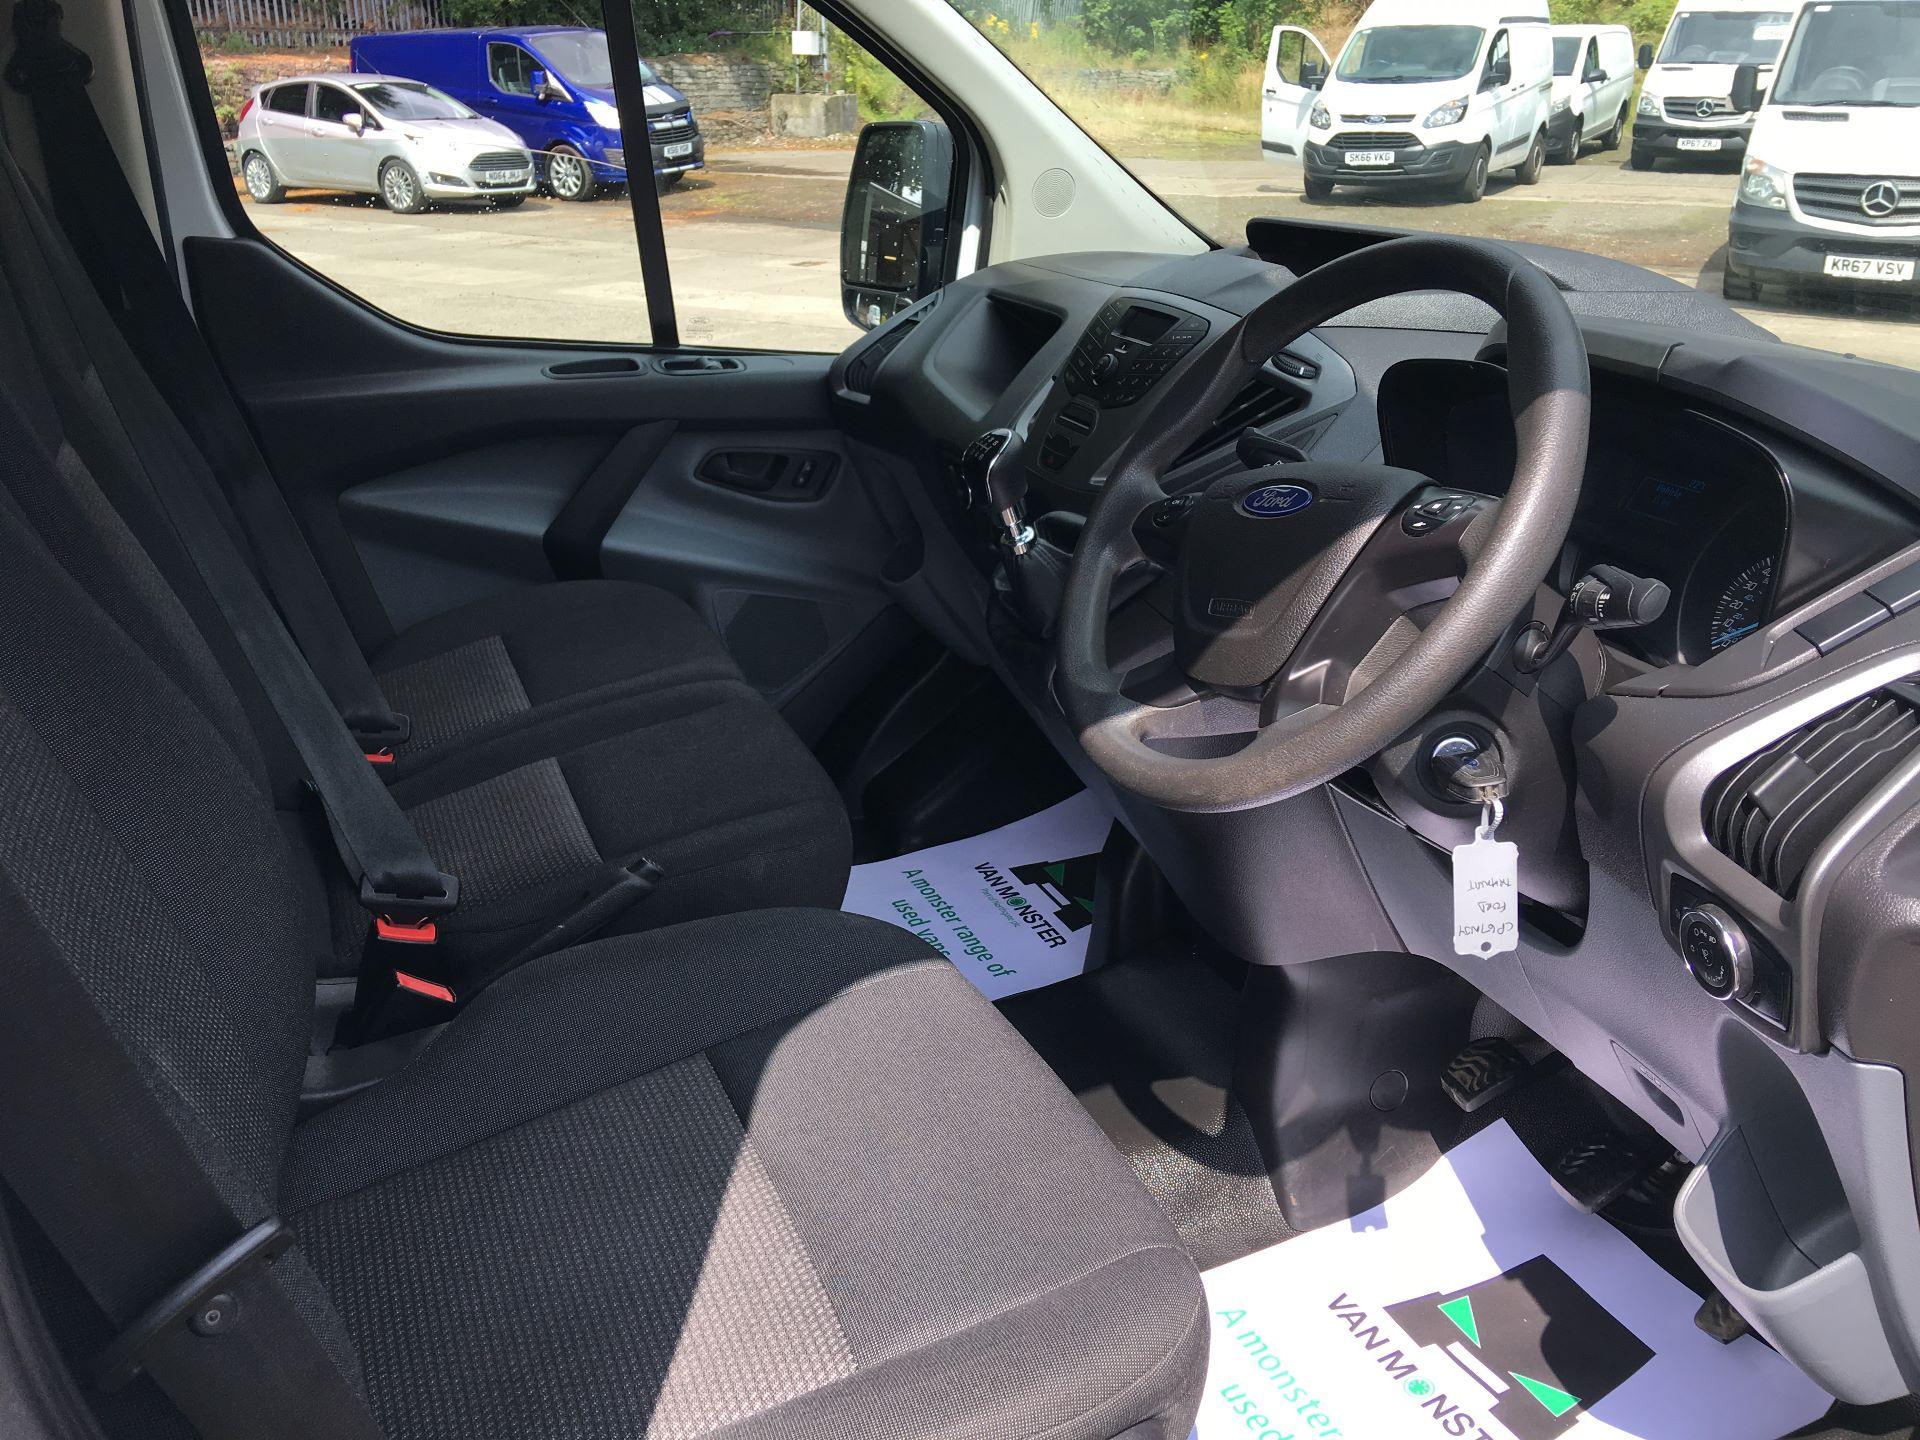 2018 Ford Transit Custom 270 L1 DIESEL FWD 2.0 TDCI 105PS LOW ROOF VAN EURO 6 (CP67NJY) Image 2